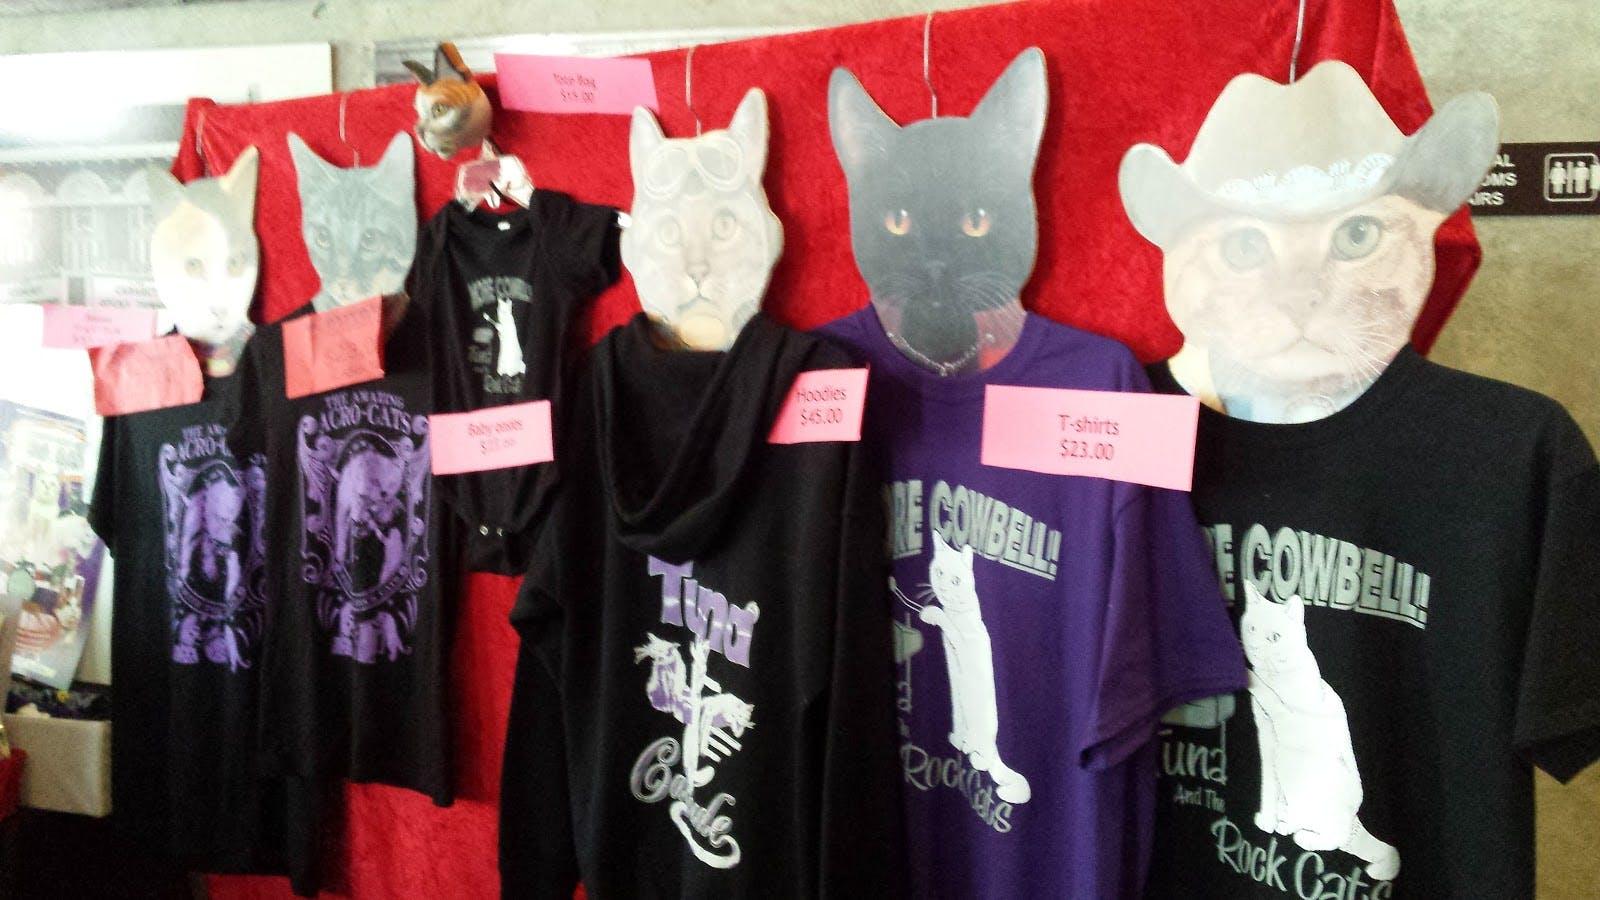 Merchandise booth display